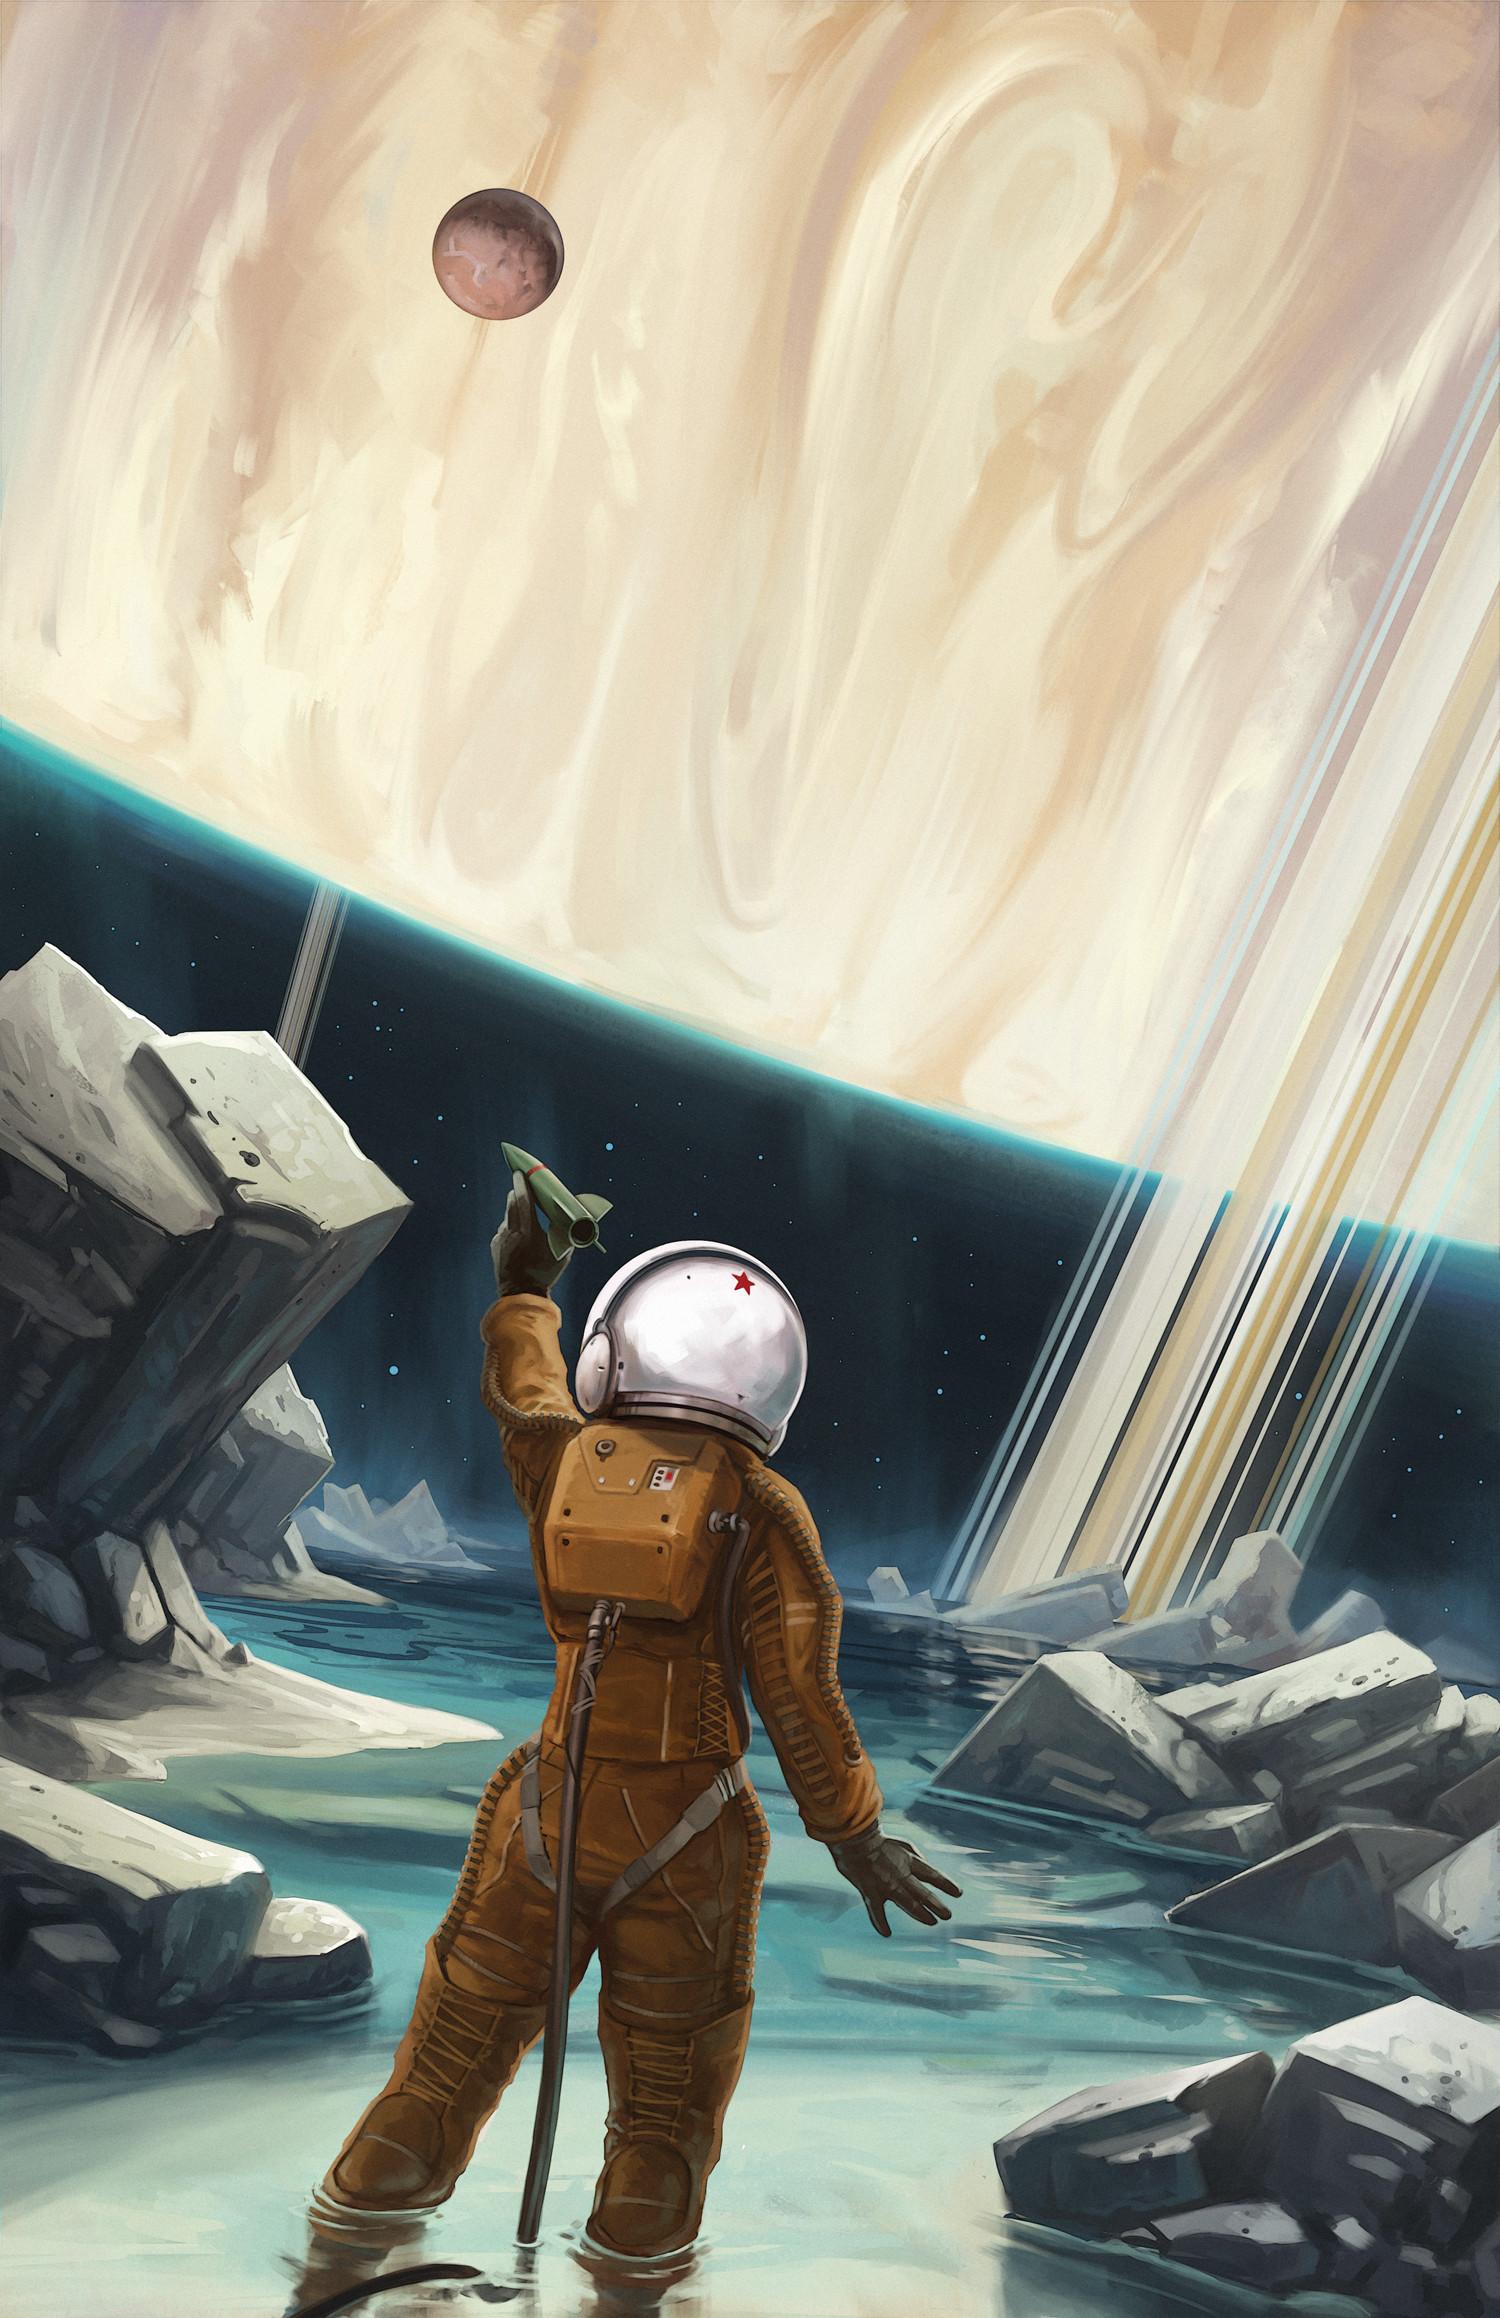 The Lonely Cosmonaut: Island Moon by Randall Mackey